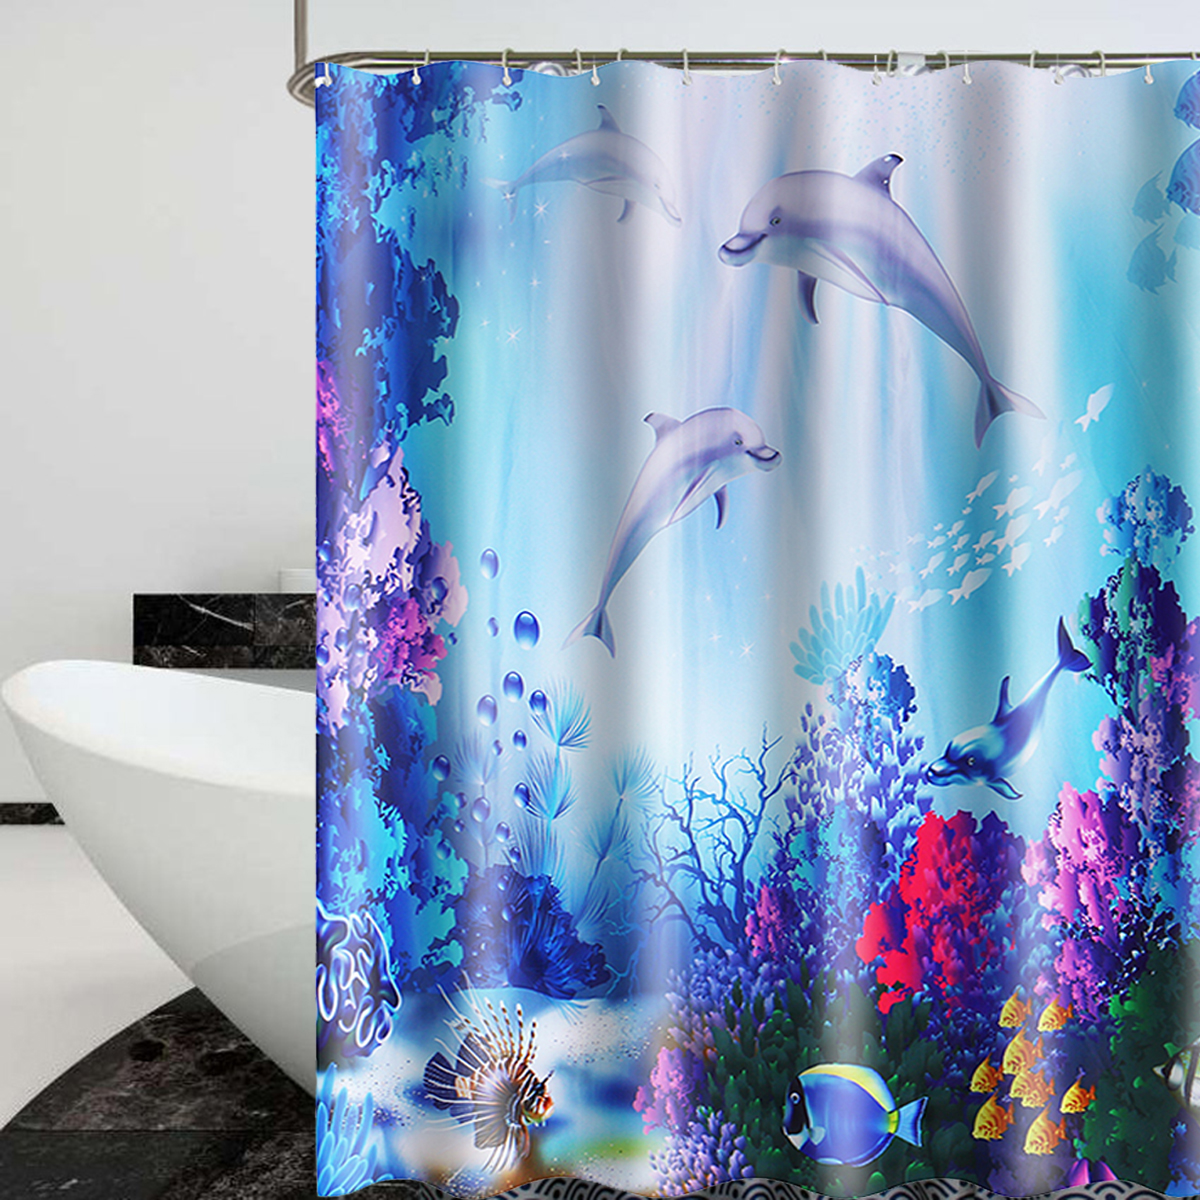 3d Thicken Undersea Coral Shower Curtain Waterproof Bathroom Toilet Bath Window Curtain With 12 Hooks Walmart Canada